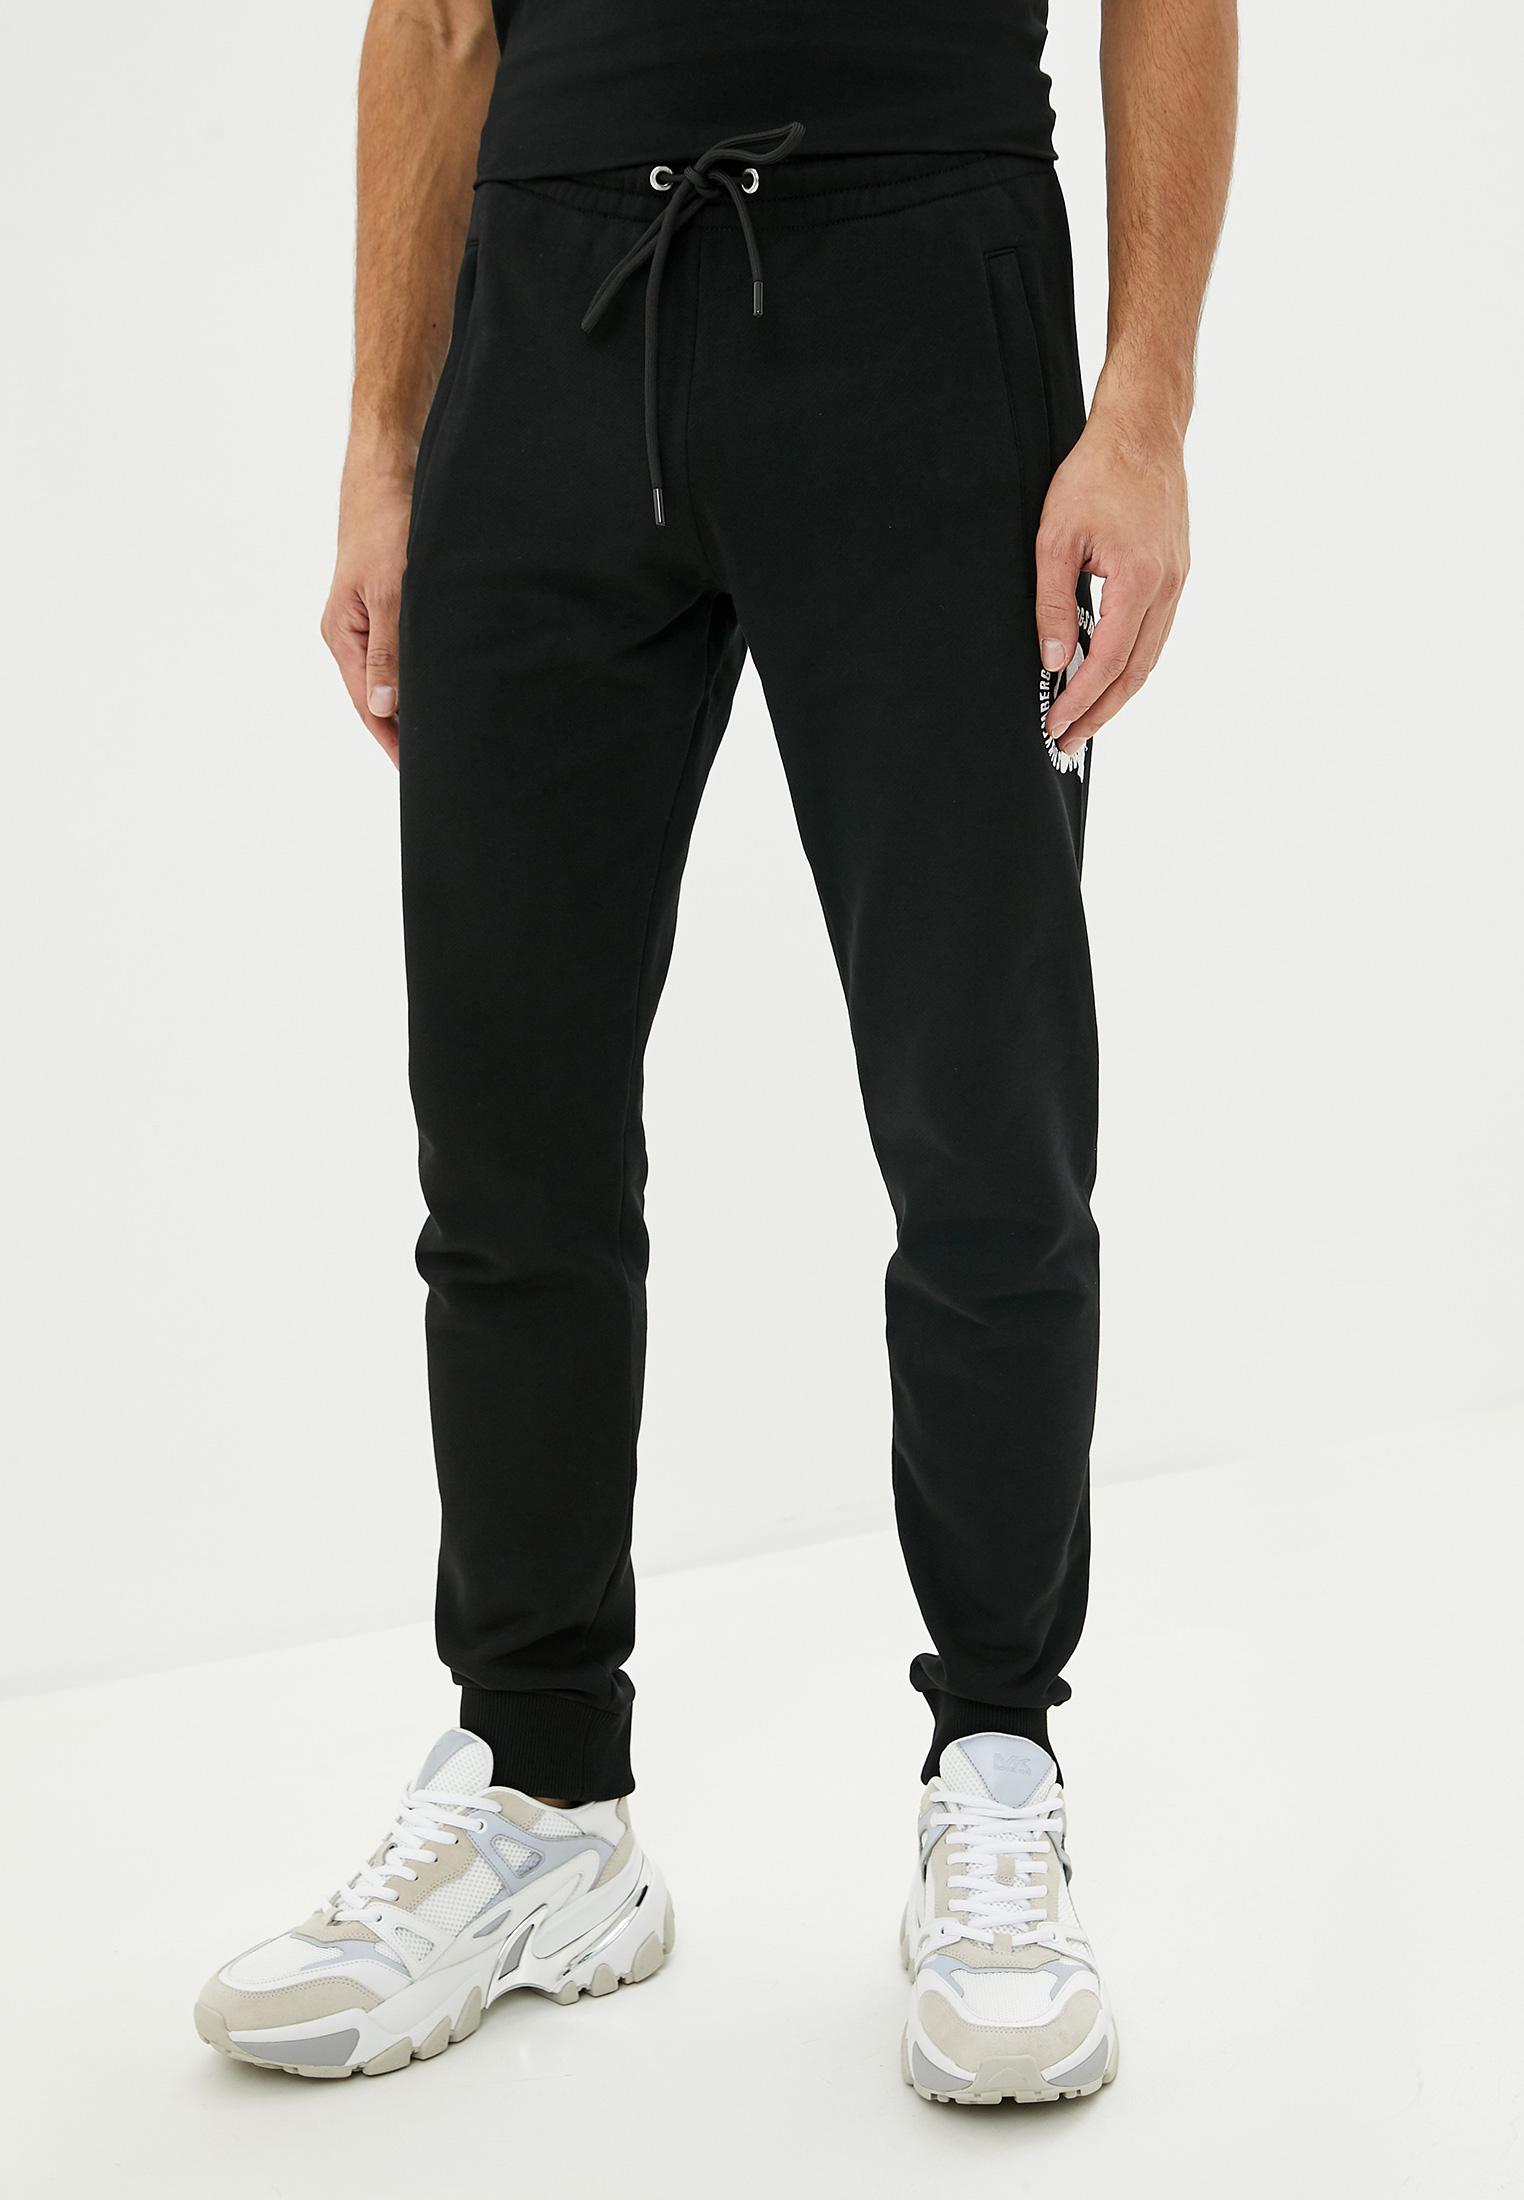 Мужские спортивные брюки Bikkembergs (Биккембергс) C 1 096 2C M 4121